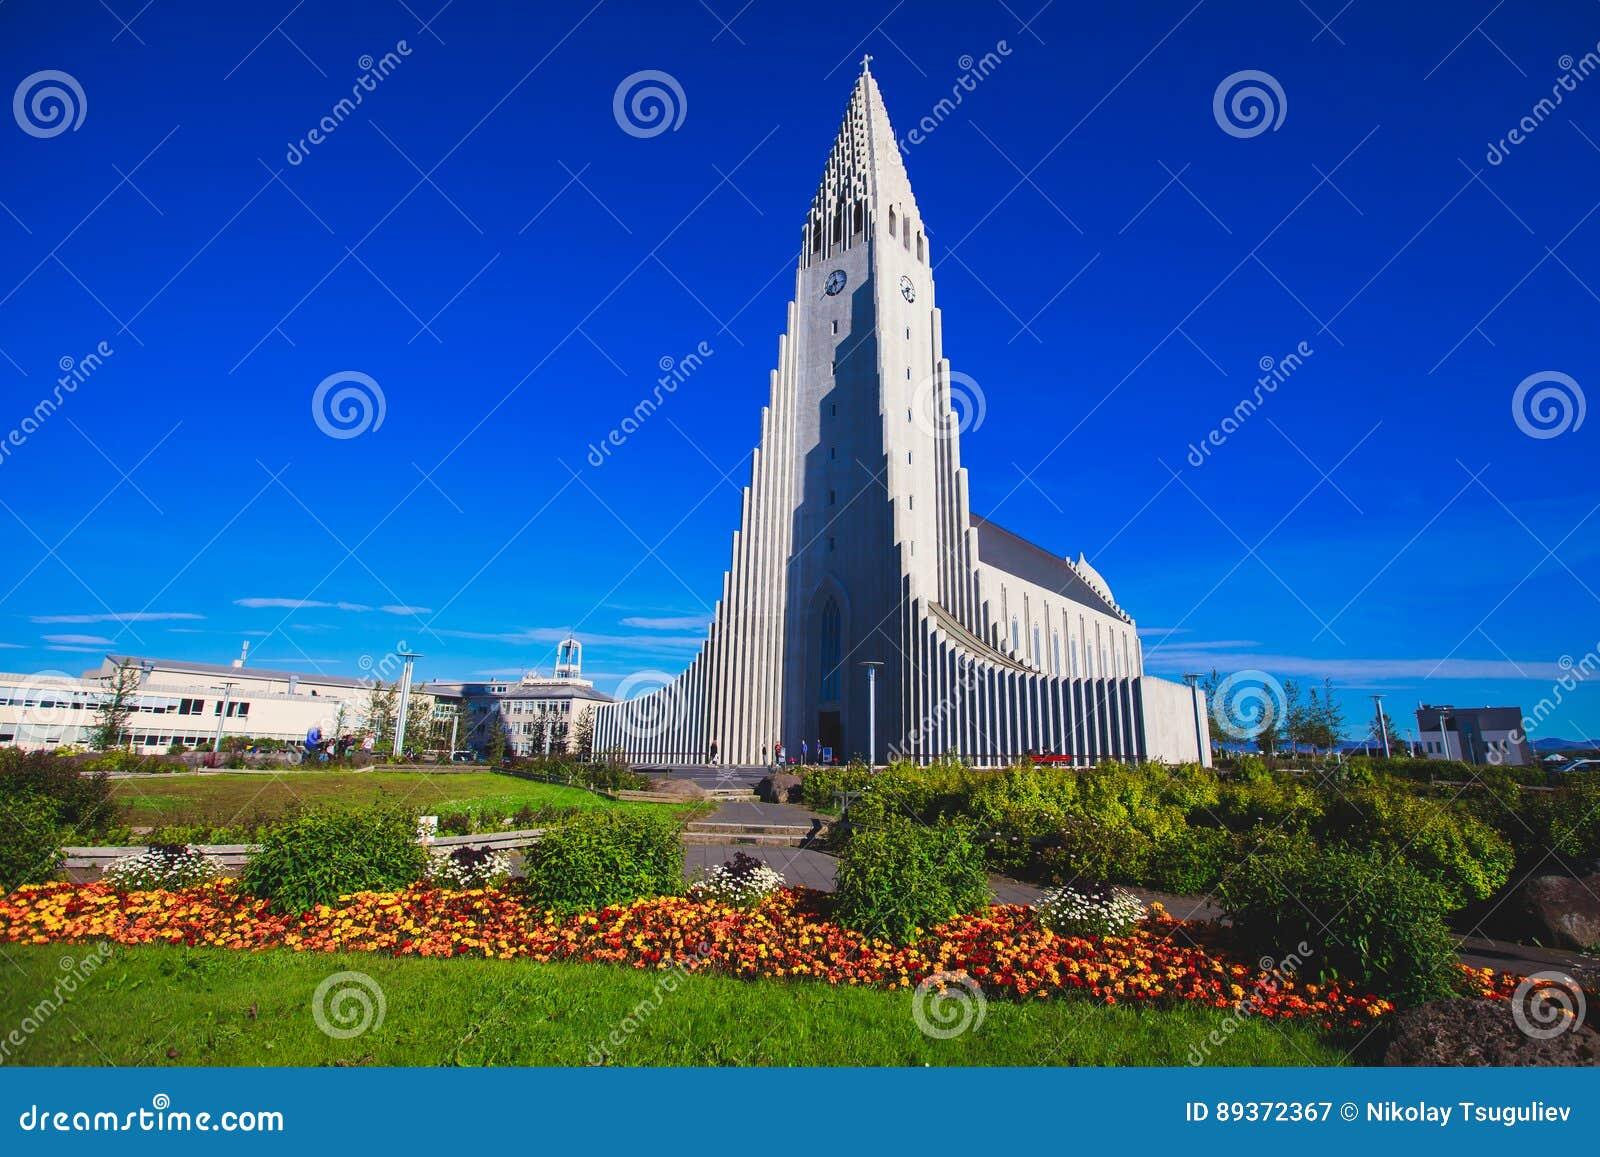 Hallgrimskirkja Cathedral in Reykjavik, Iceland, lutheran parish church, exterior in a sunny summer